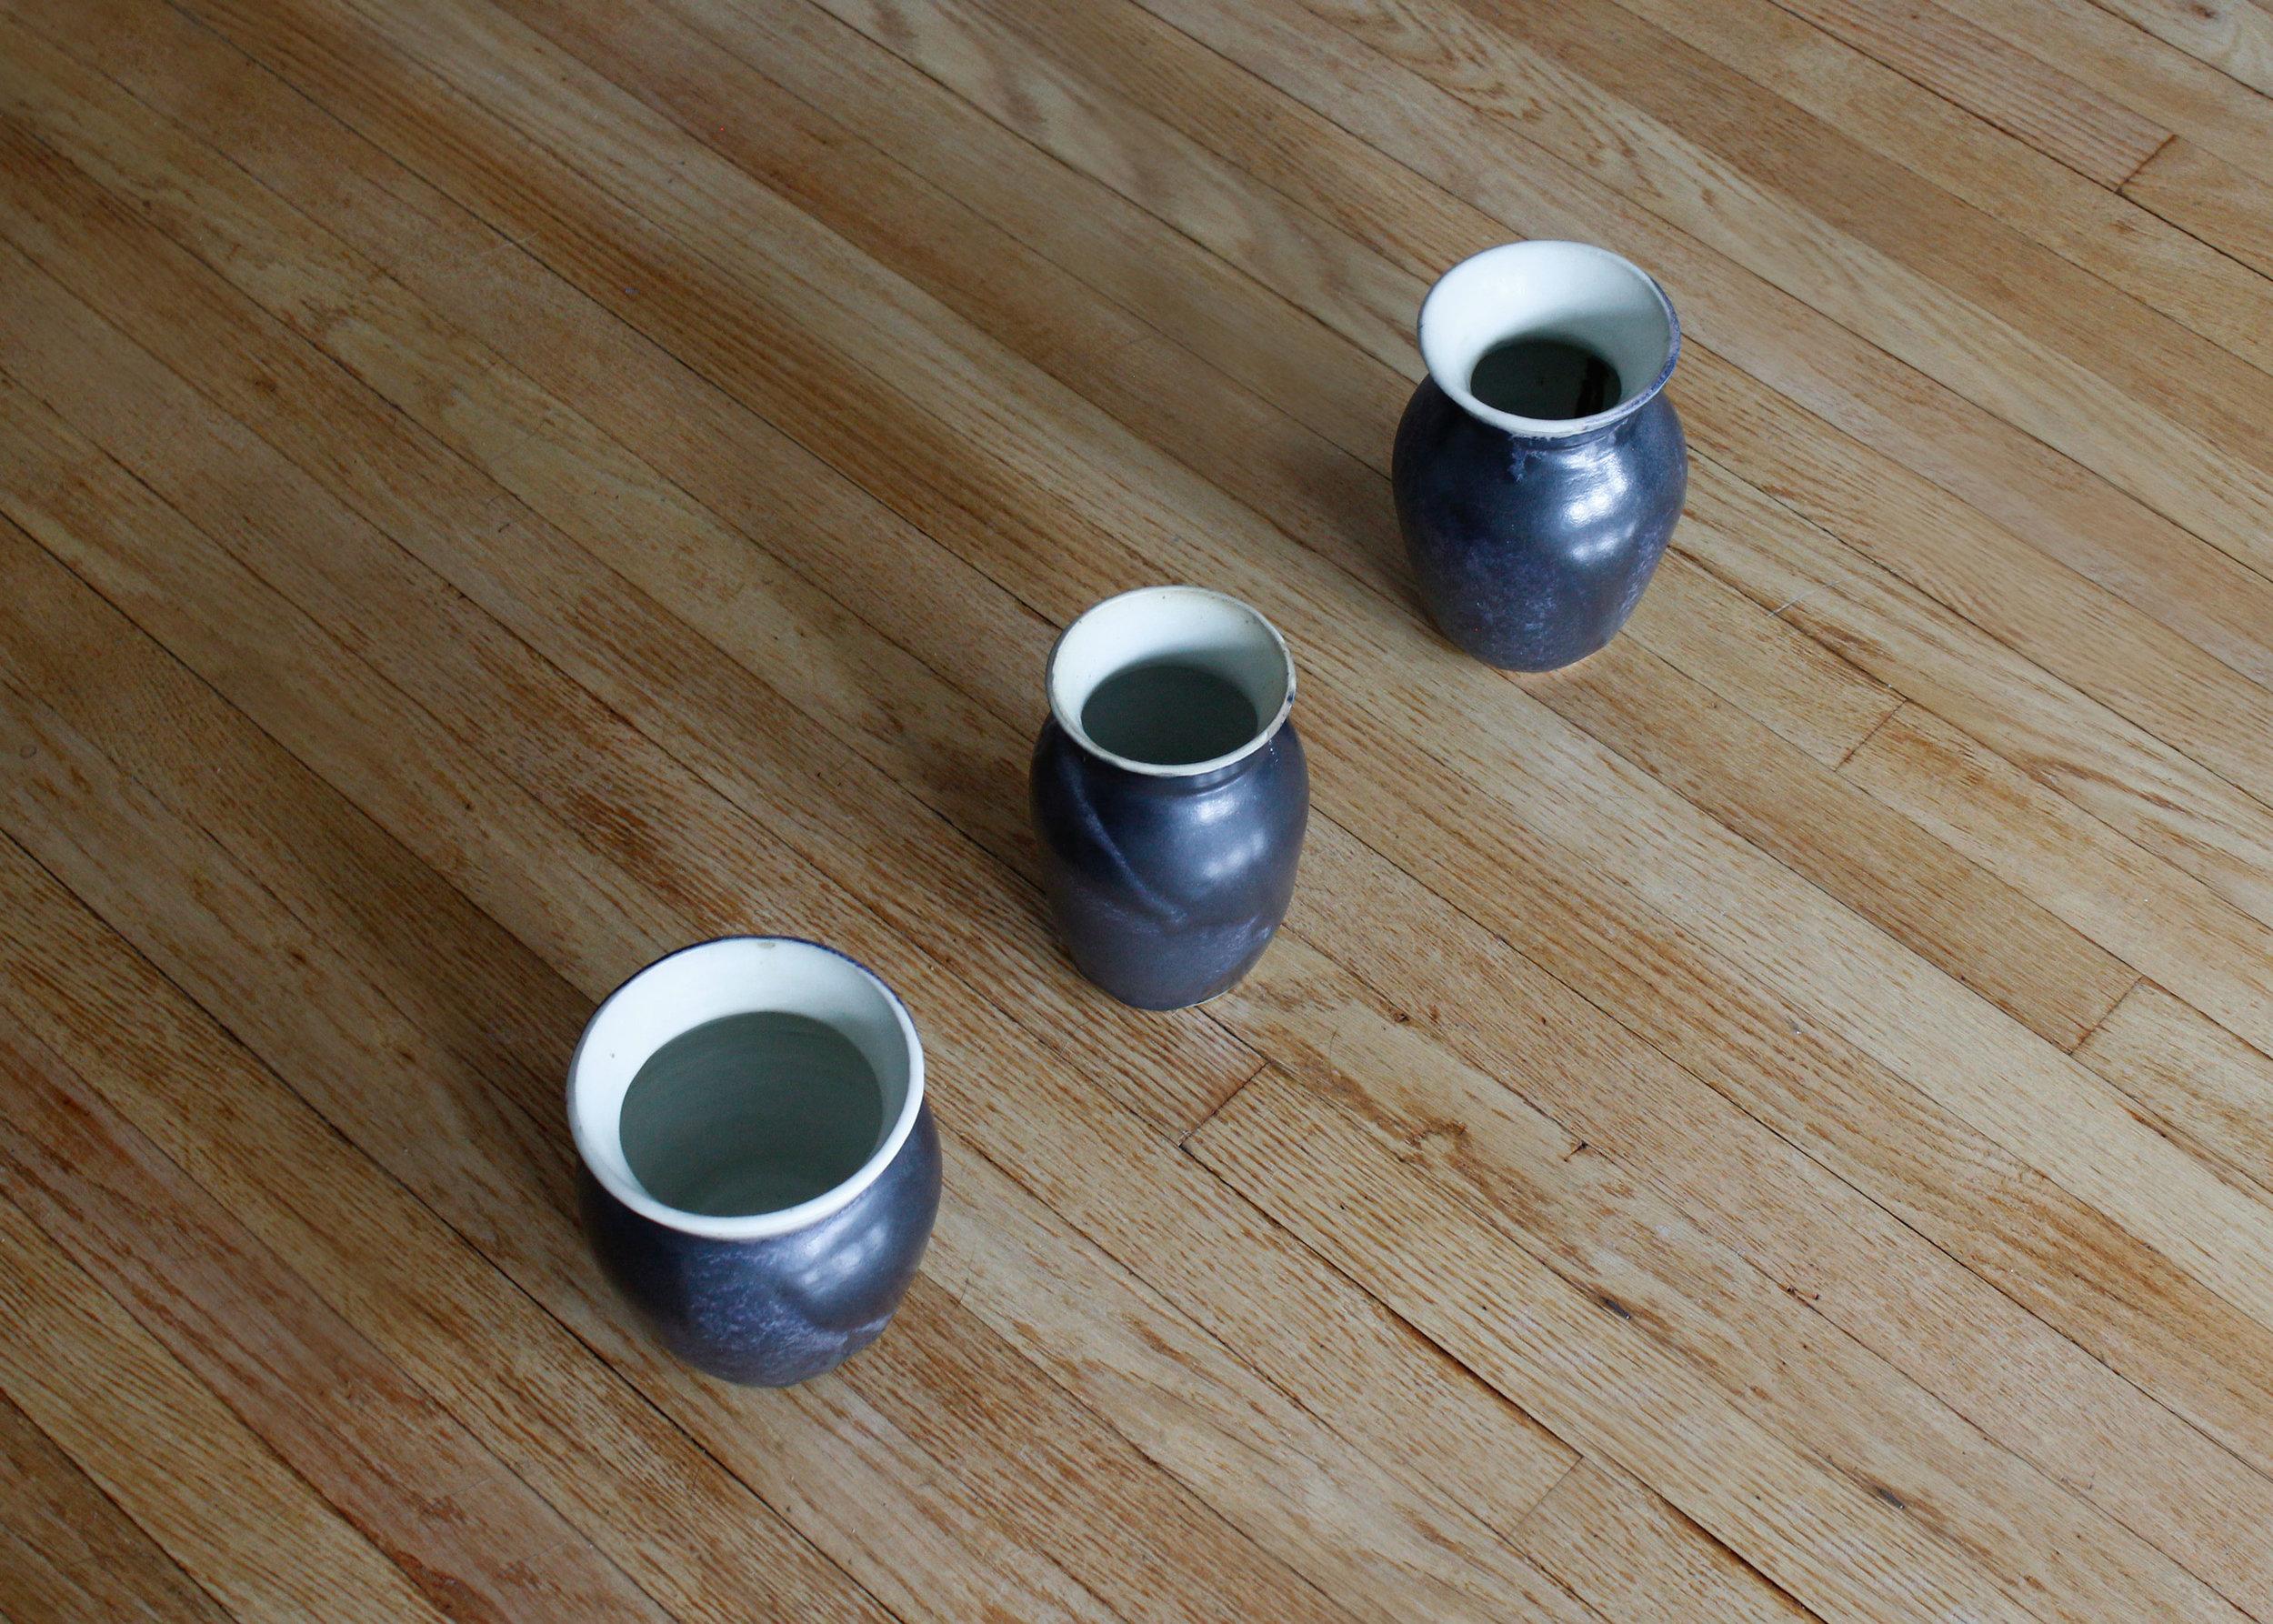 James-Rivas_Decay-Vase-Series_F.jpg